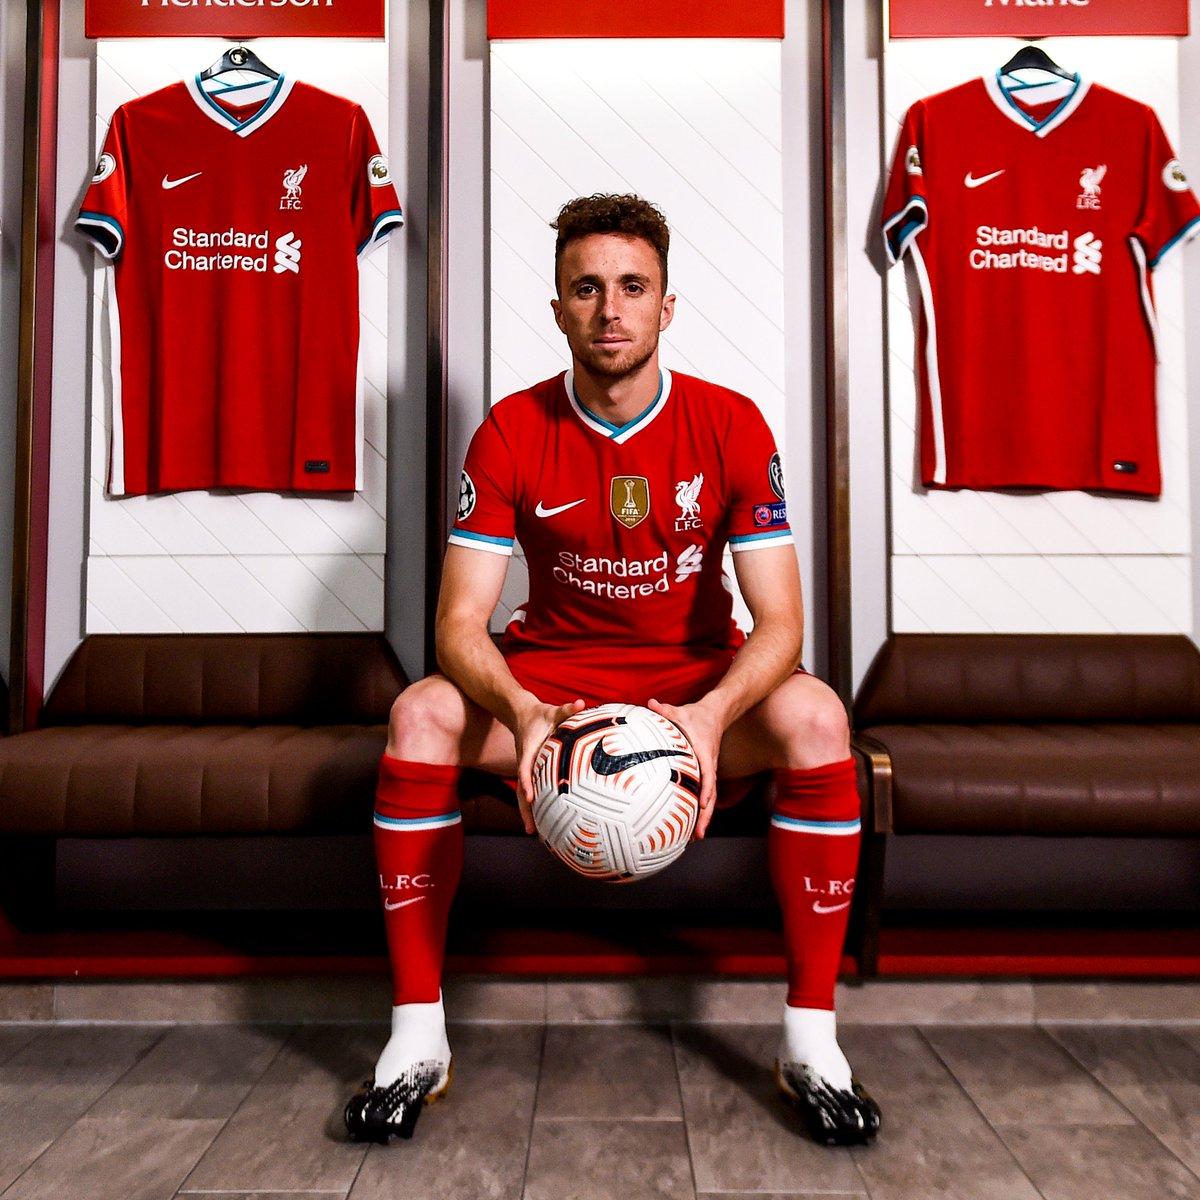 Liverpool's new forward 🇵🇹 https://t.co/fu1WoMbH8N